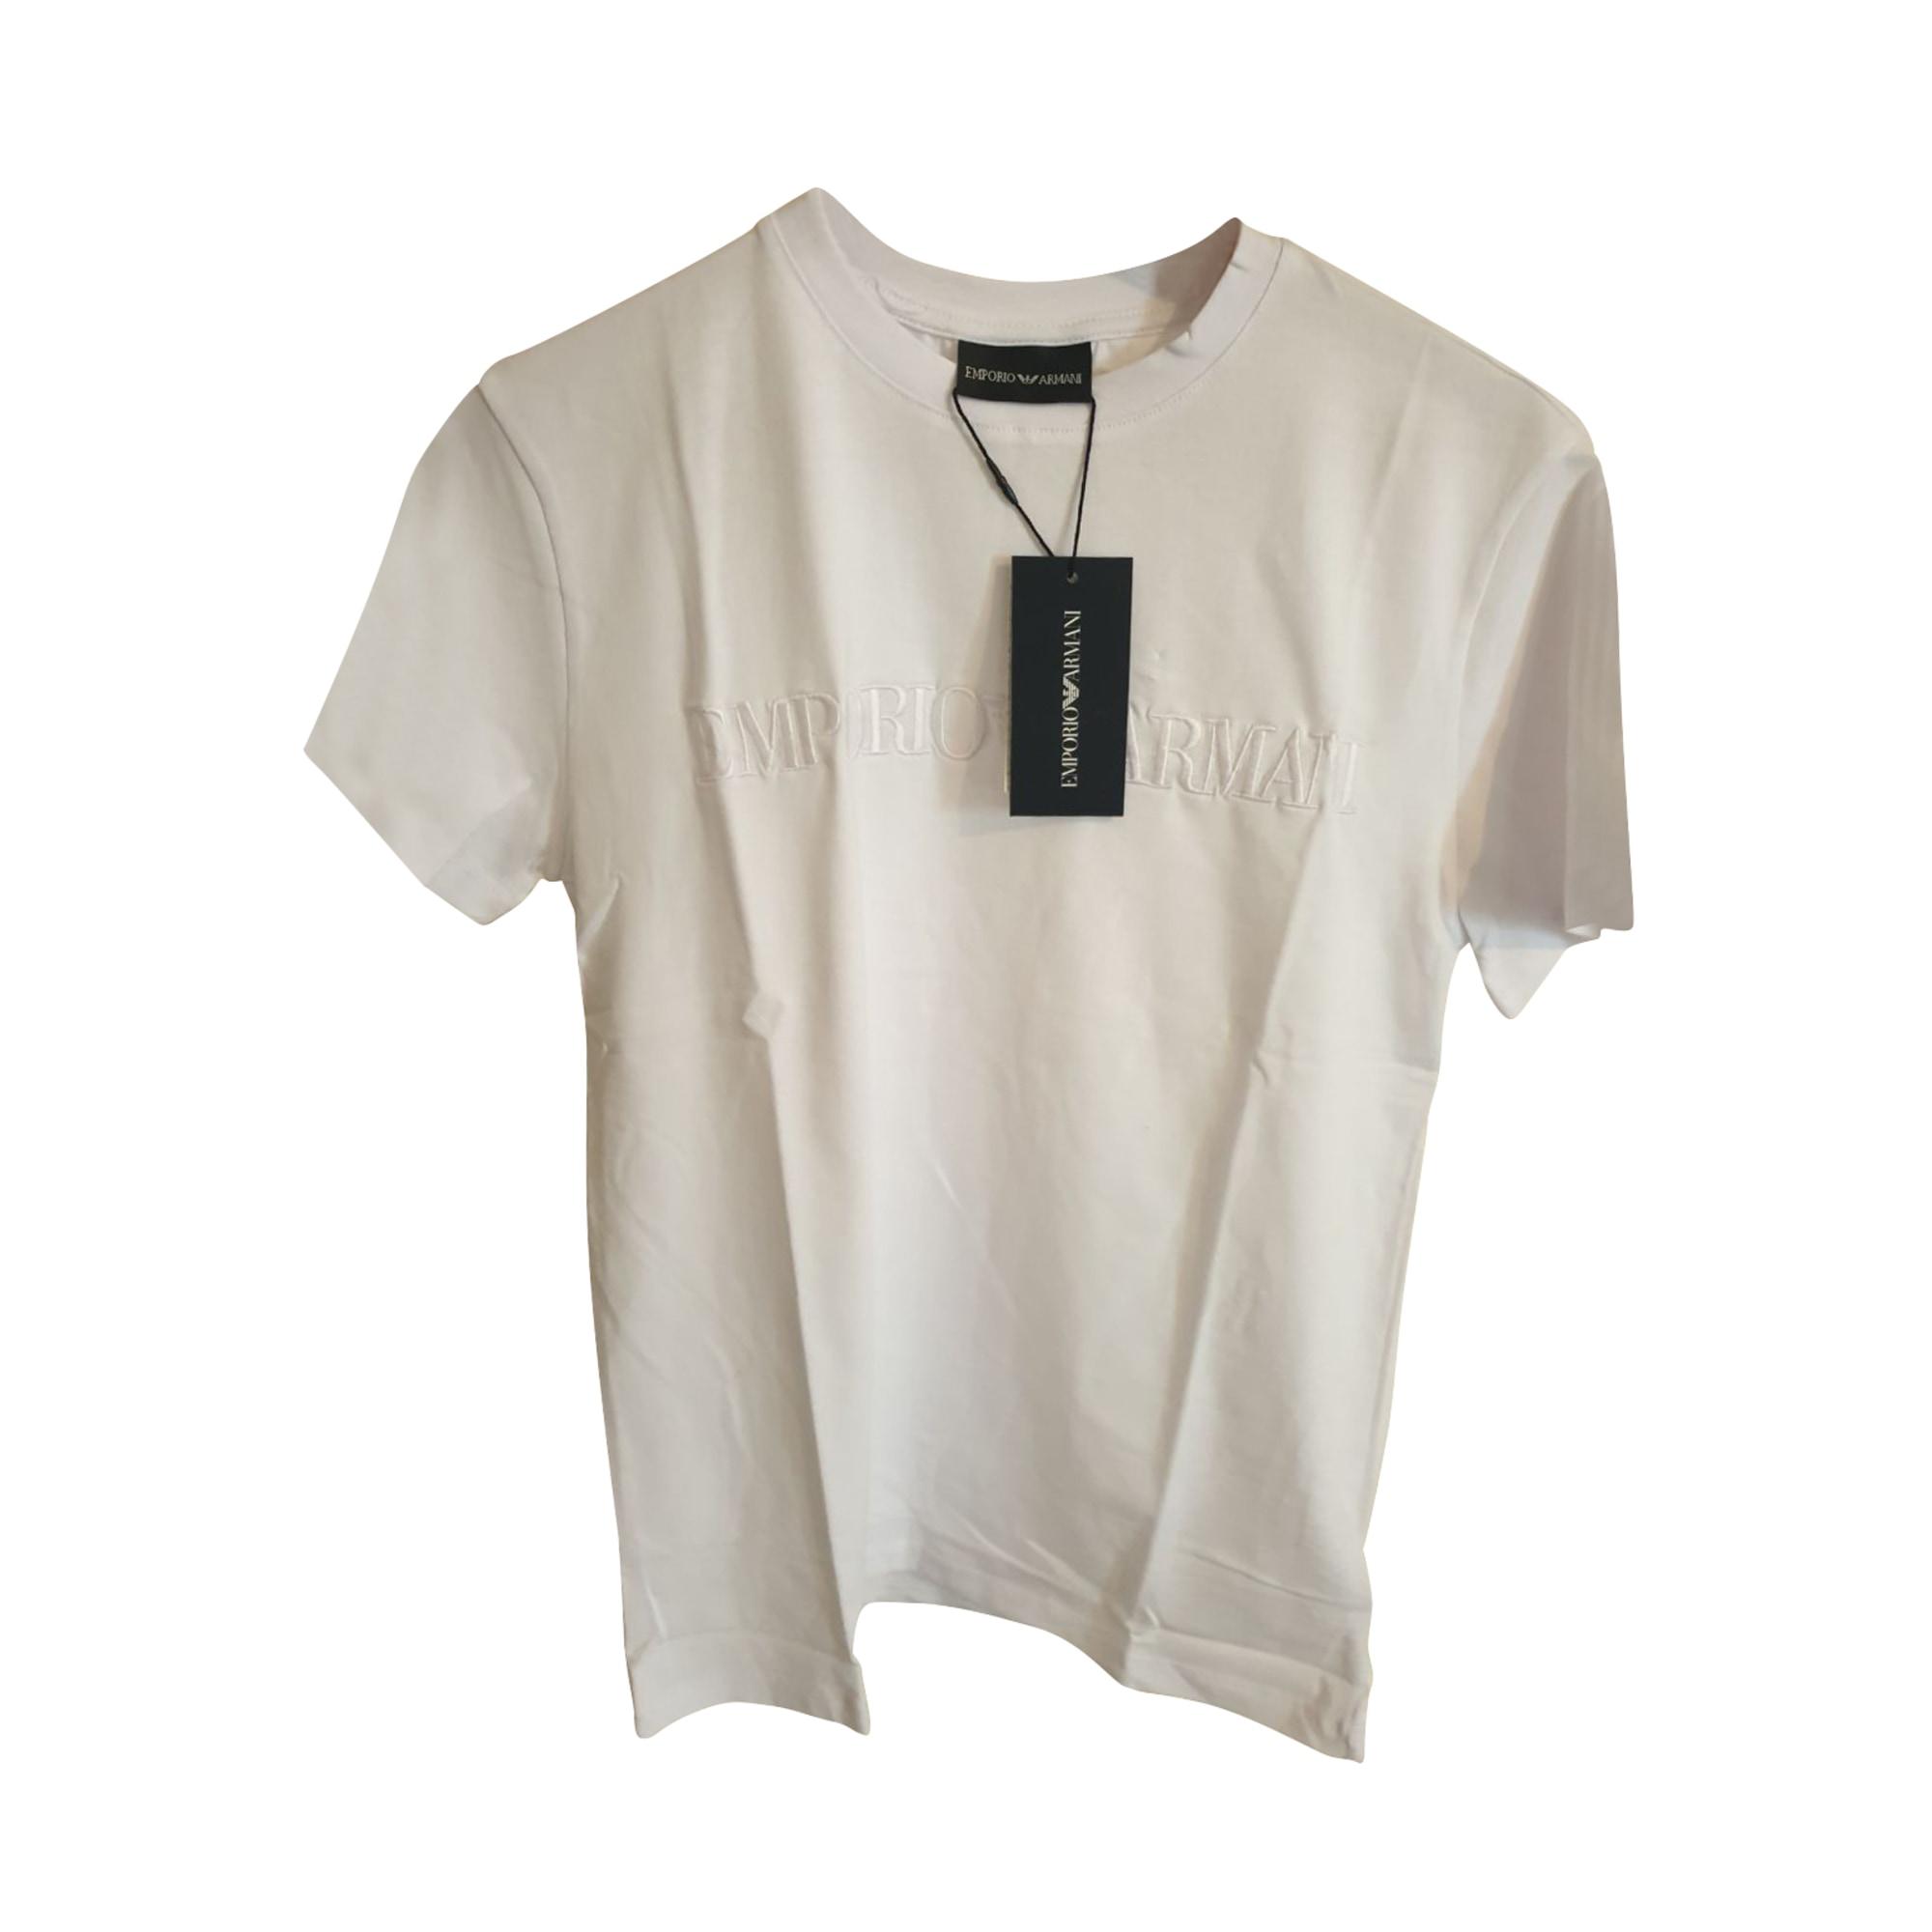 T-shirt EMPORIO ARMANI White, off-white, ecru